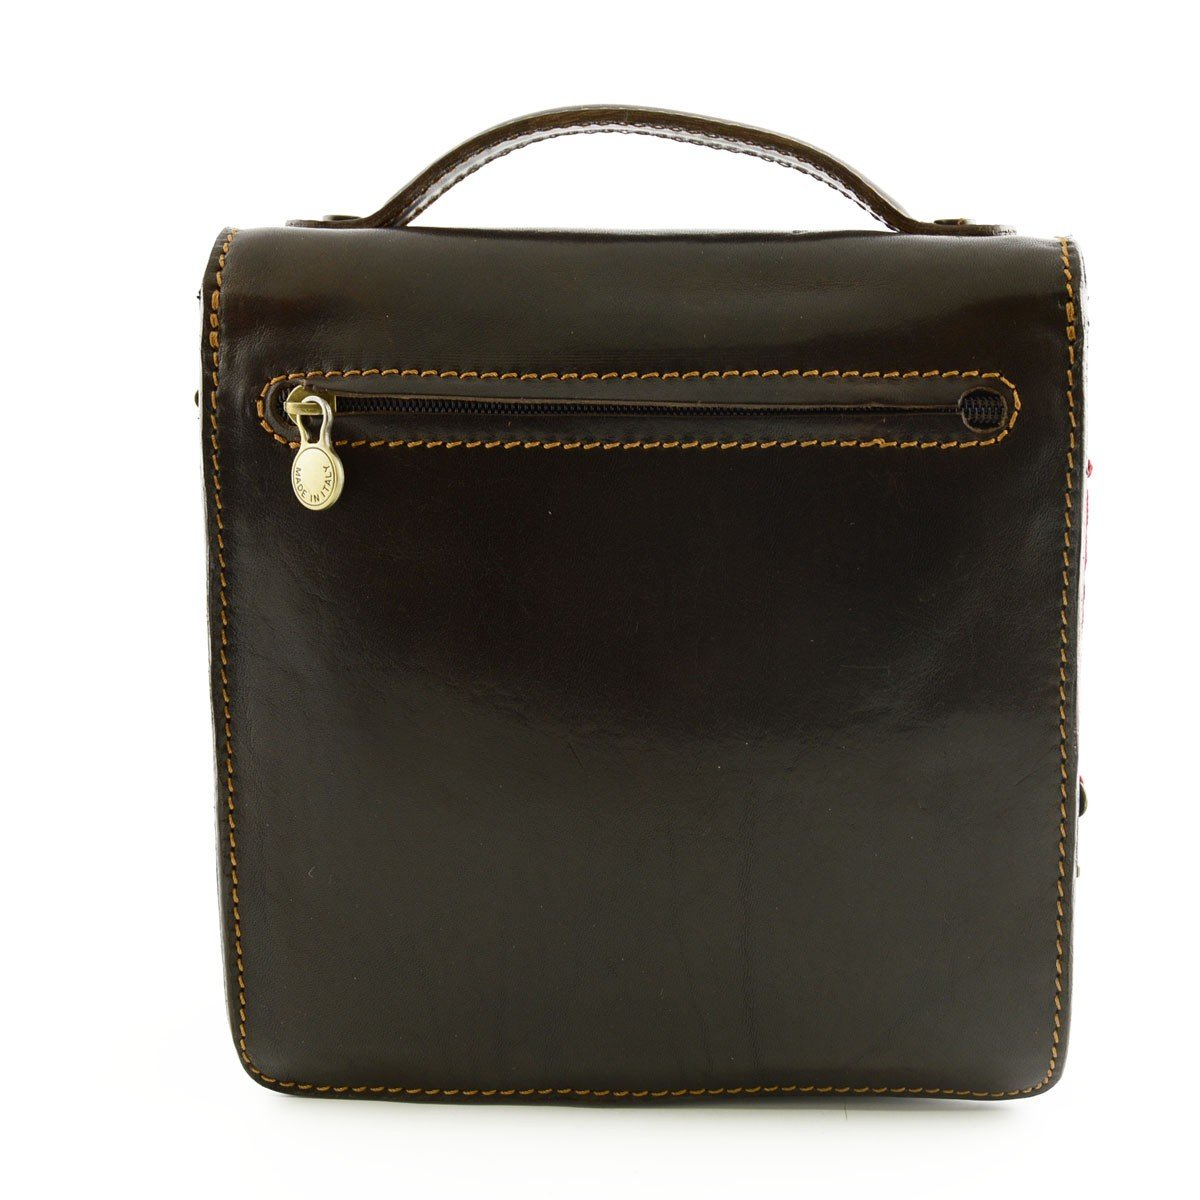 Man Leather Bag Color Dark Brown